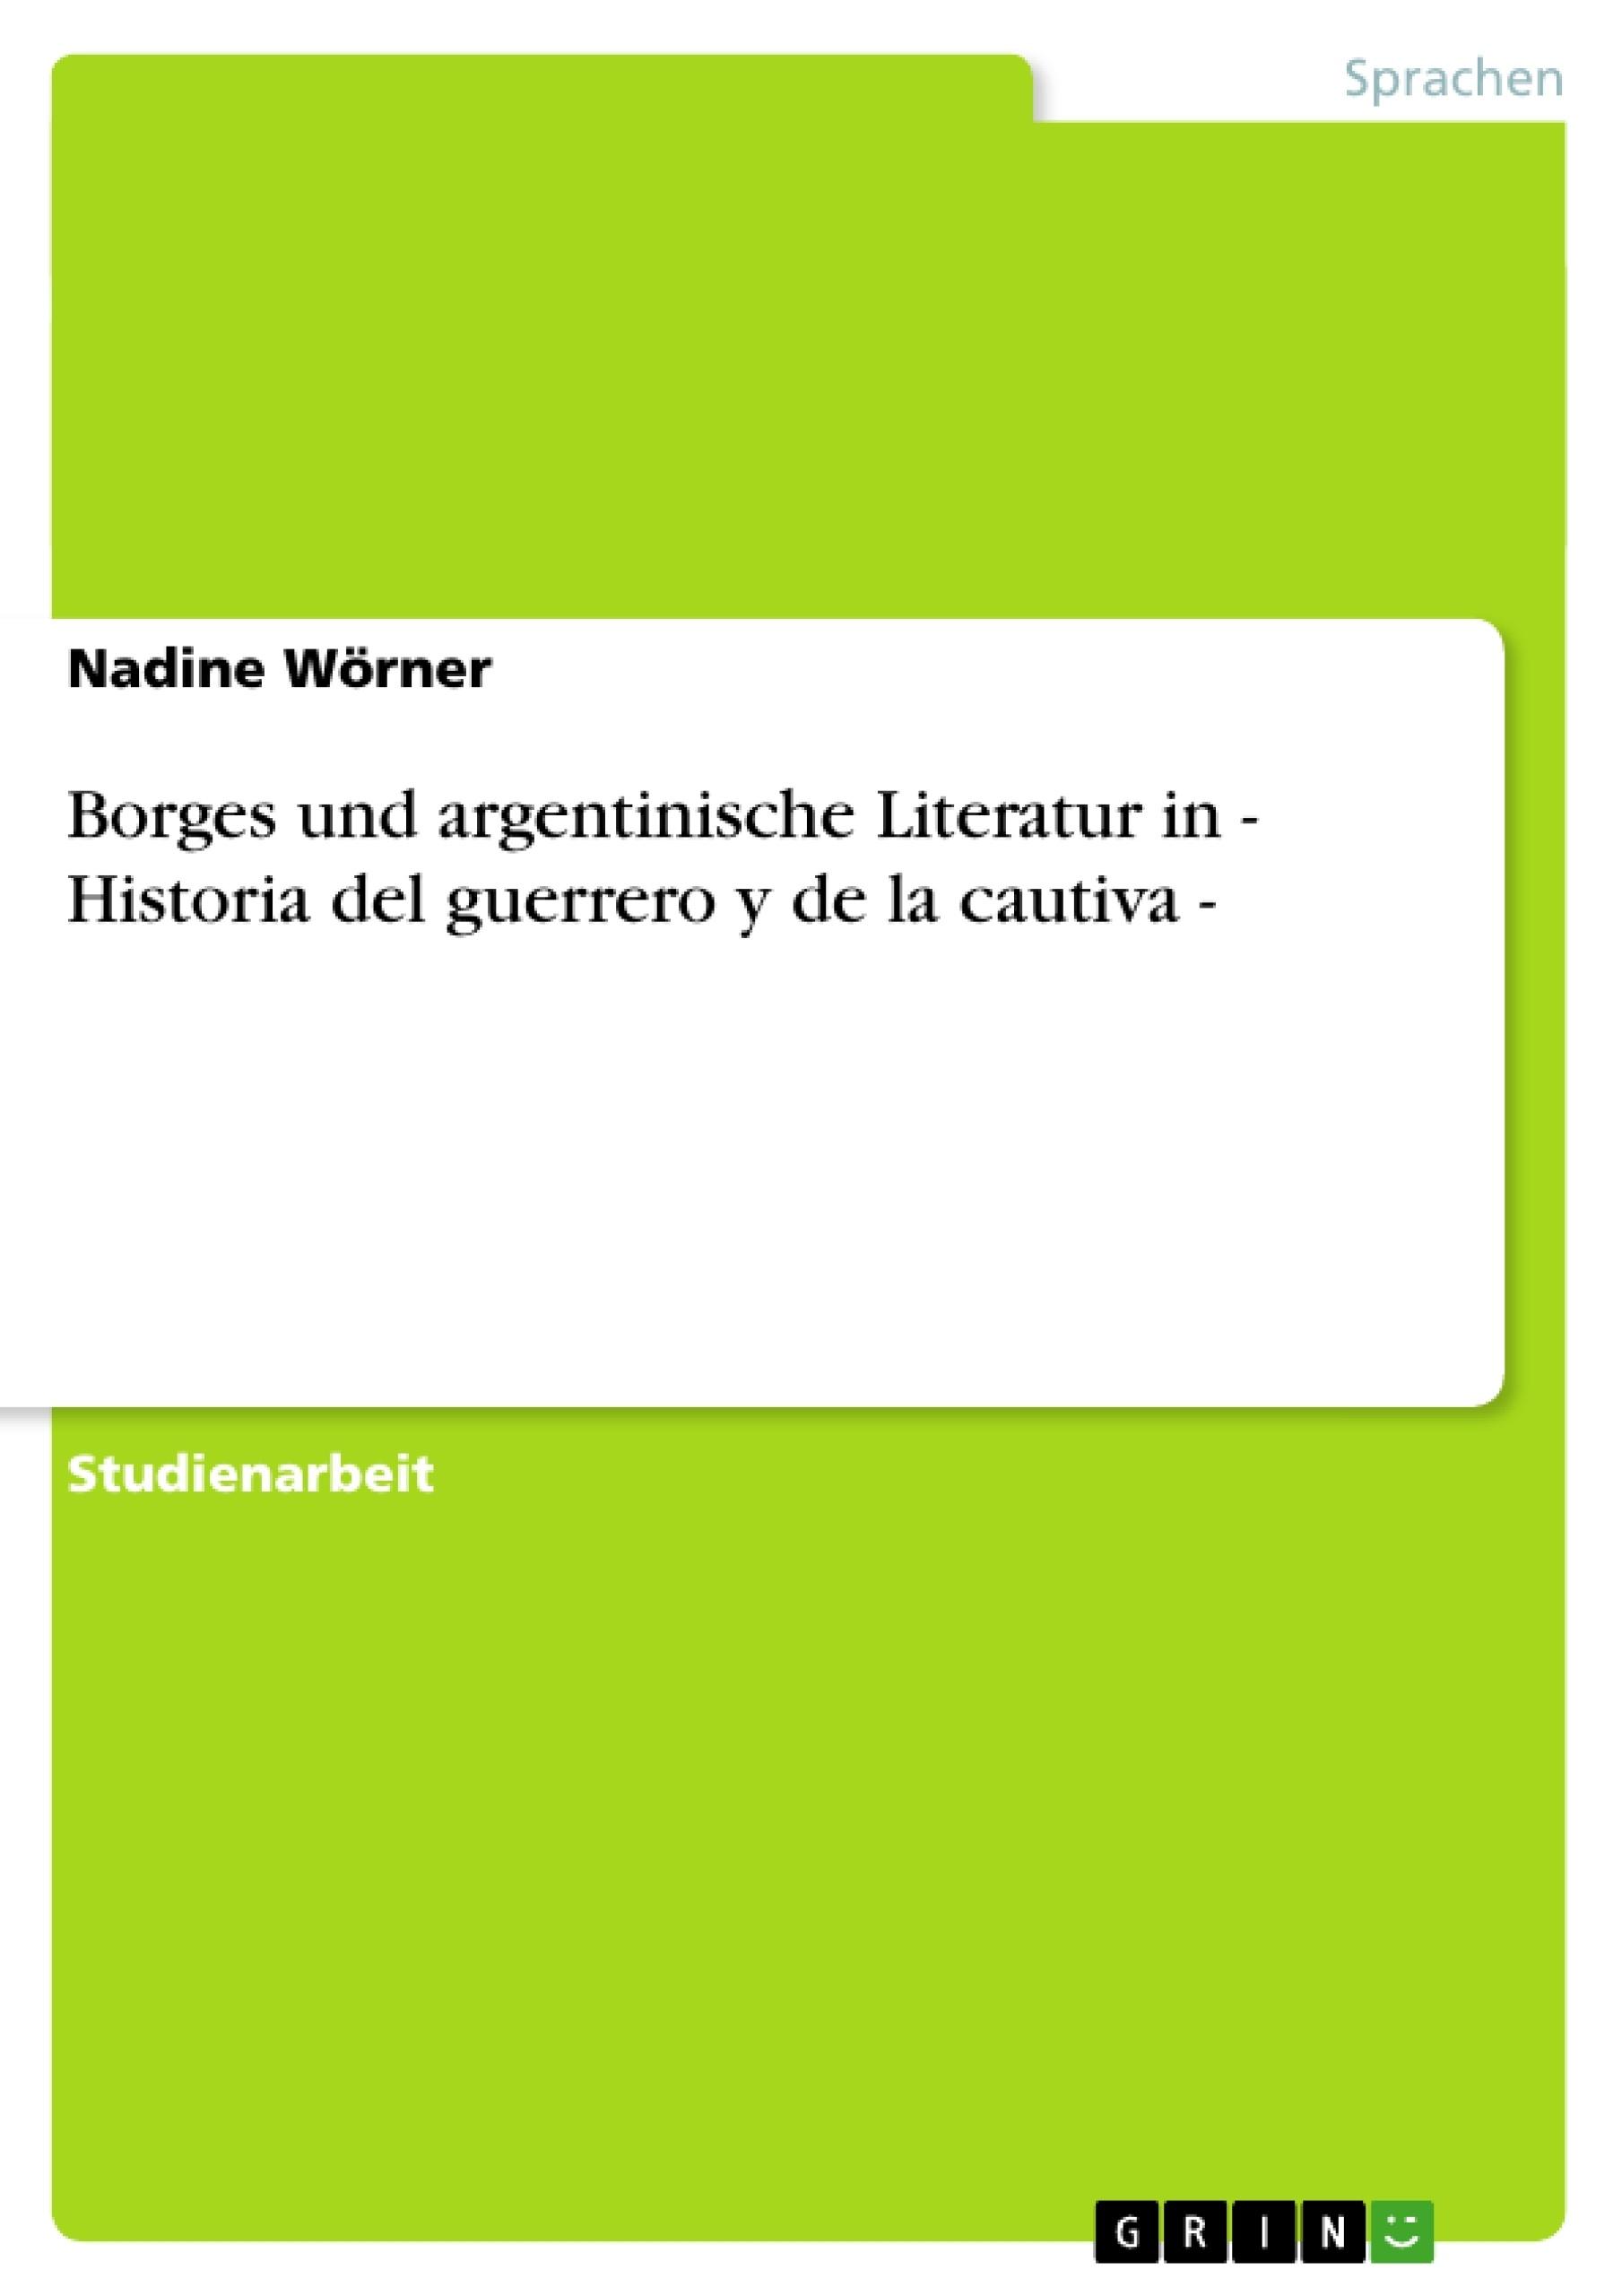 Titel: Borges und argentinische Literatur in - Historia del guerrero y de la cautiva -